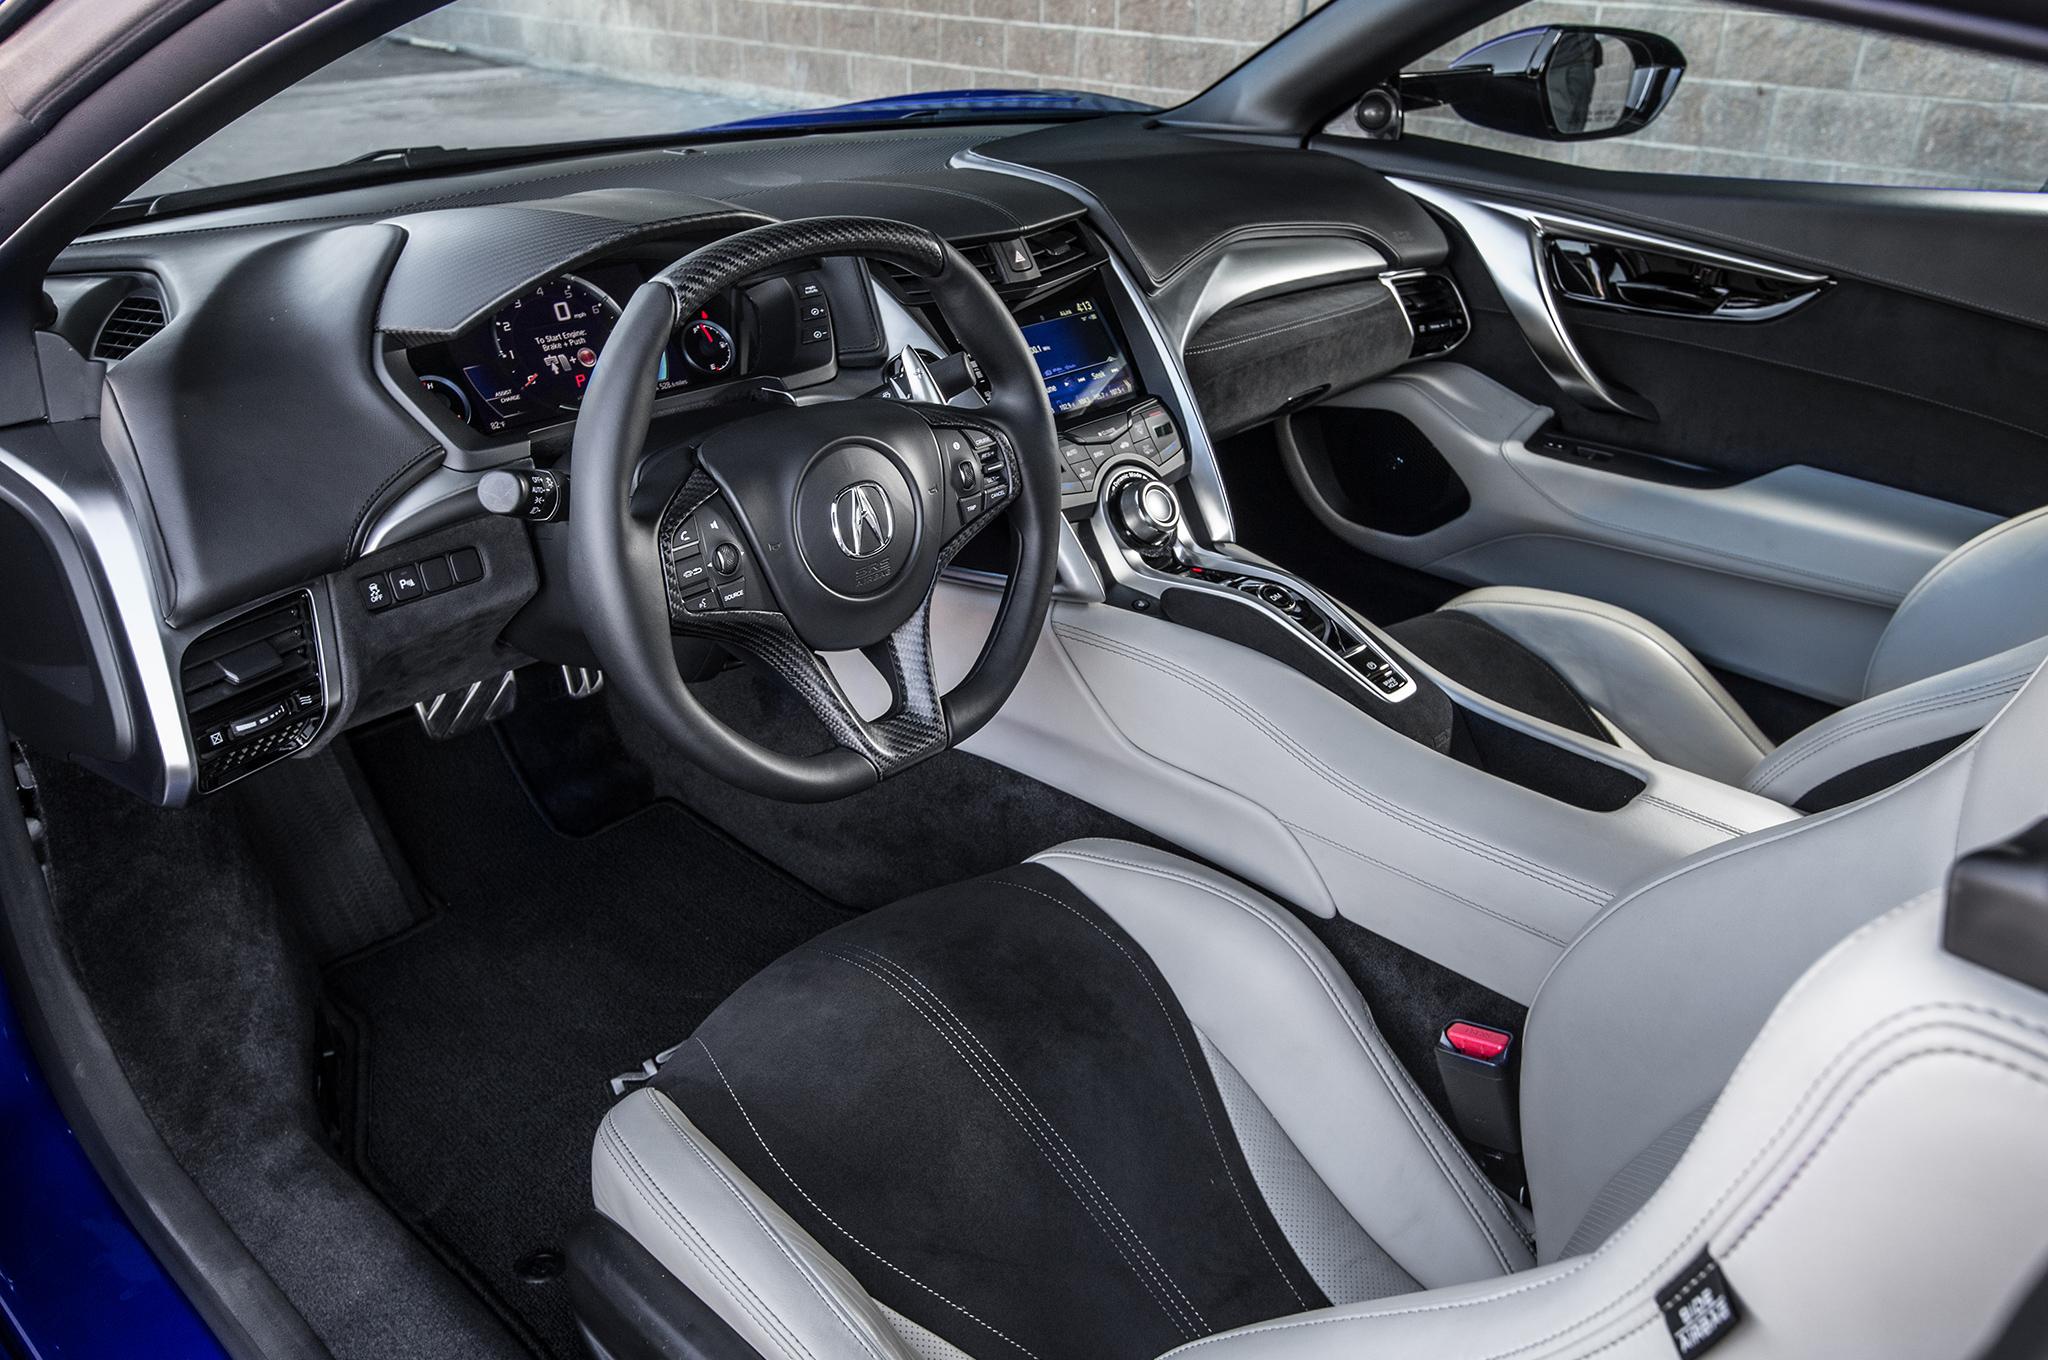 2017-acura-nsx-interior – The Unmuffled Auto News